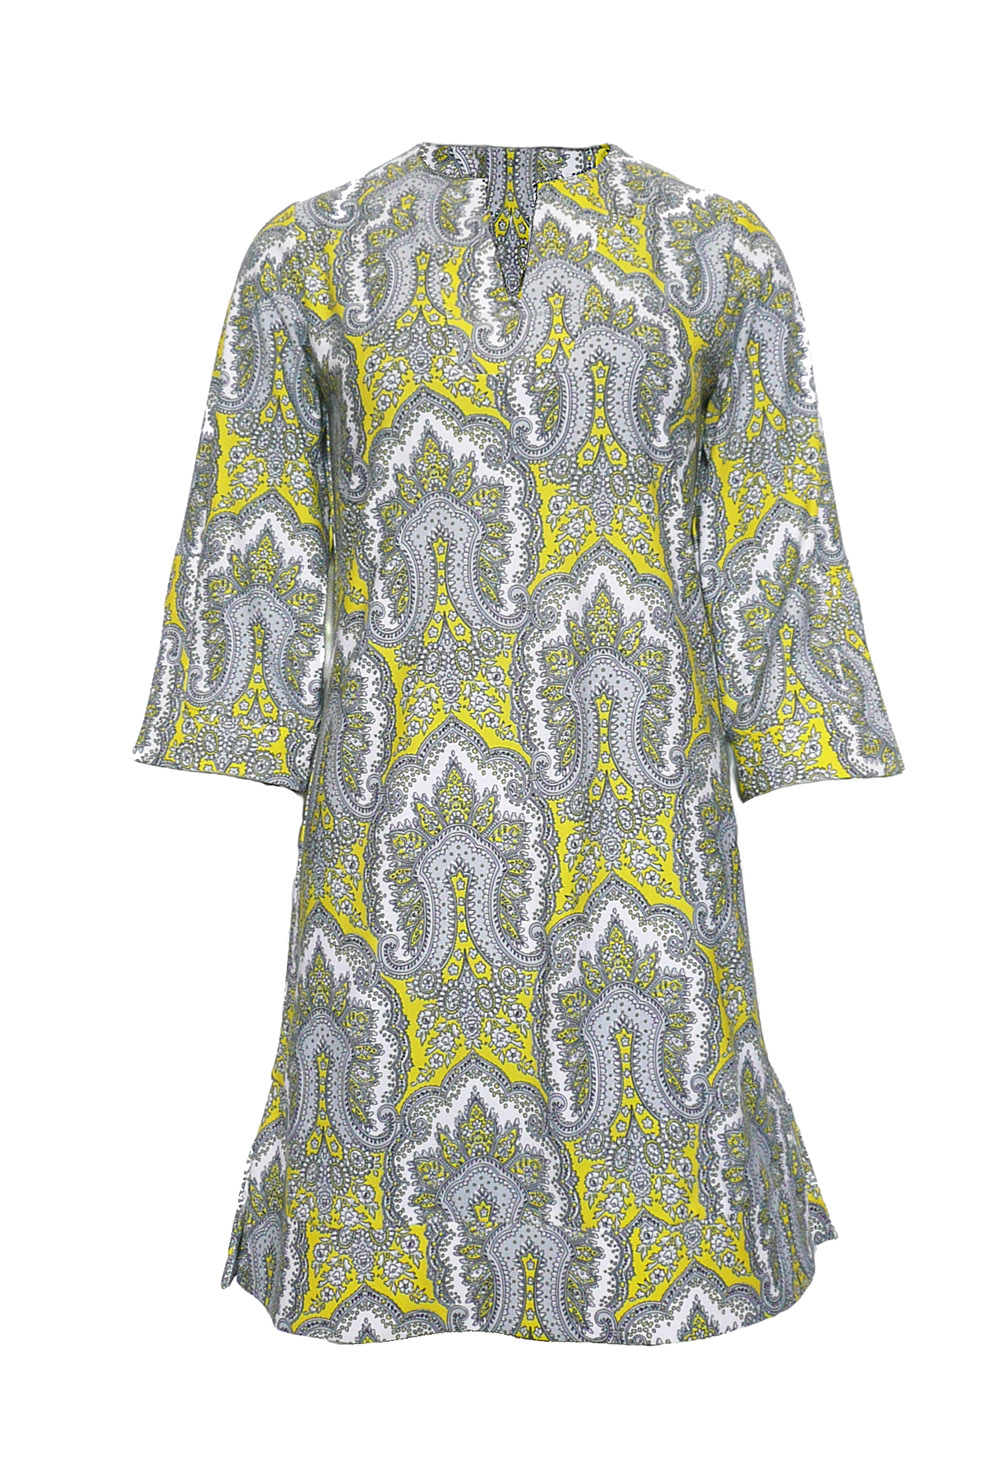 dress lime paisley tunic.jpg